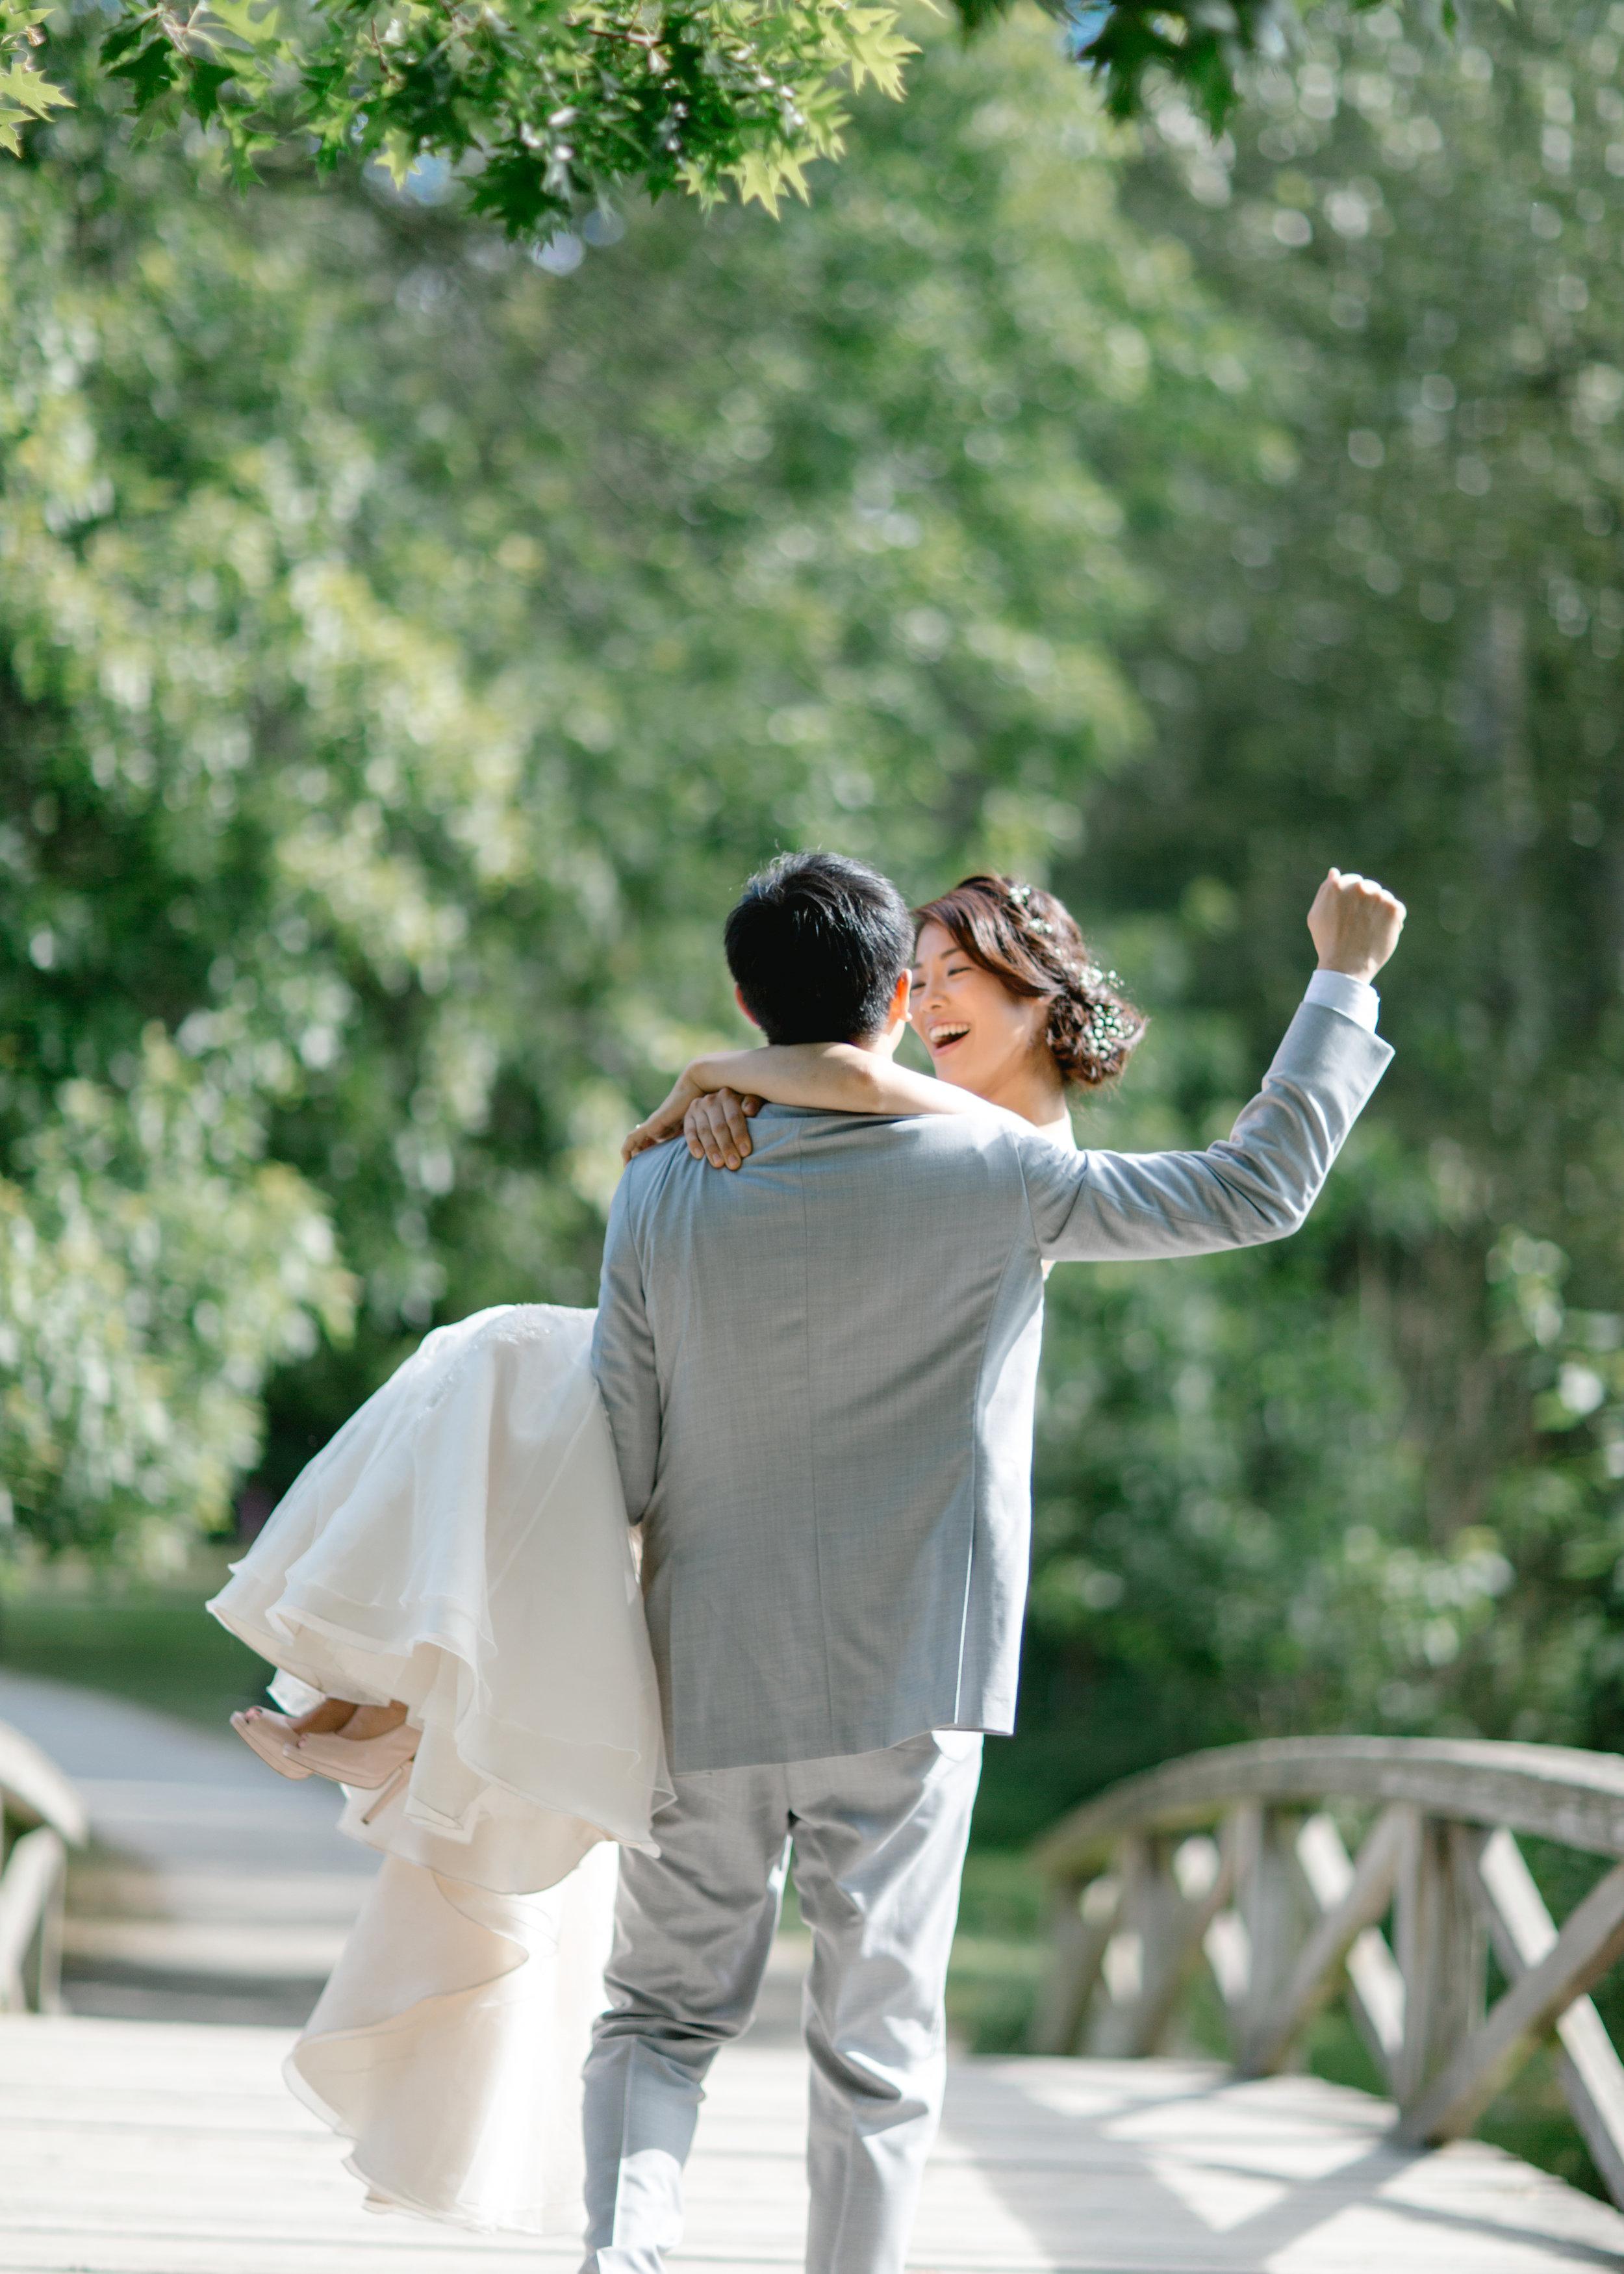 herafilms_wedding_hannah_david_hera_selects-49.jpg